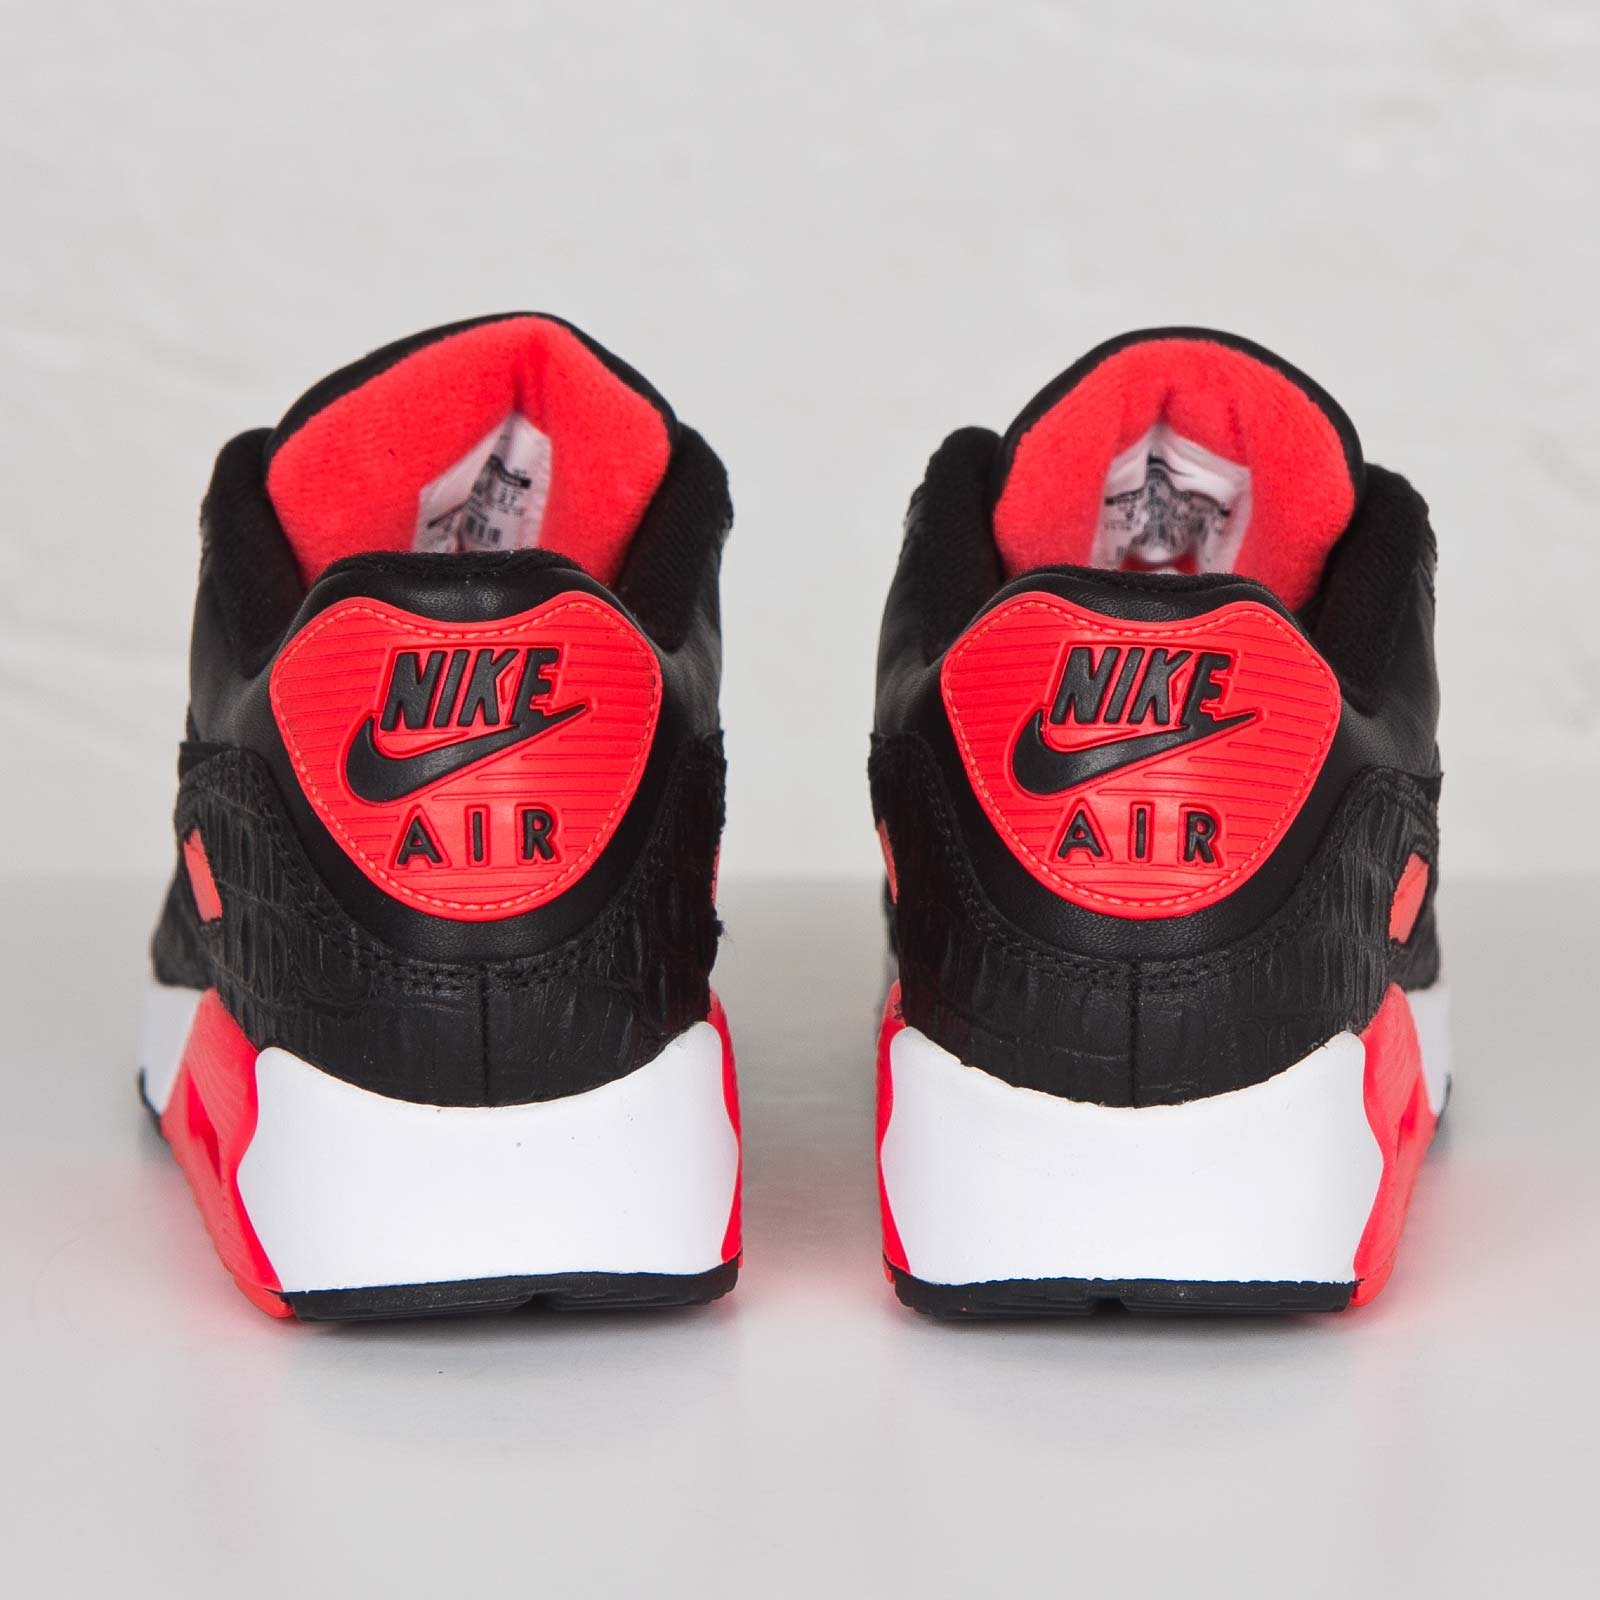 huge selection of 2fbbb 7e8cb Nike Air Max 90 Anniversary - 725235-006 - Sneakersnstuff   sneakers    streetwear online since 1999